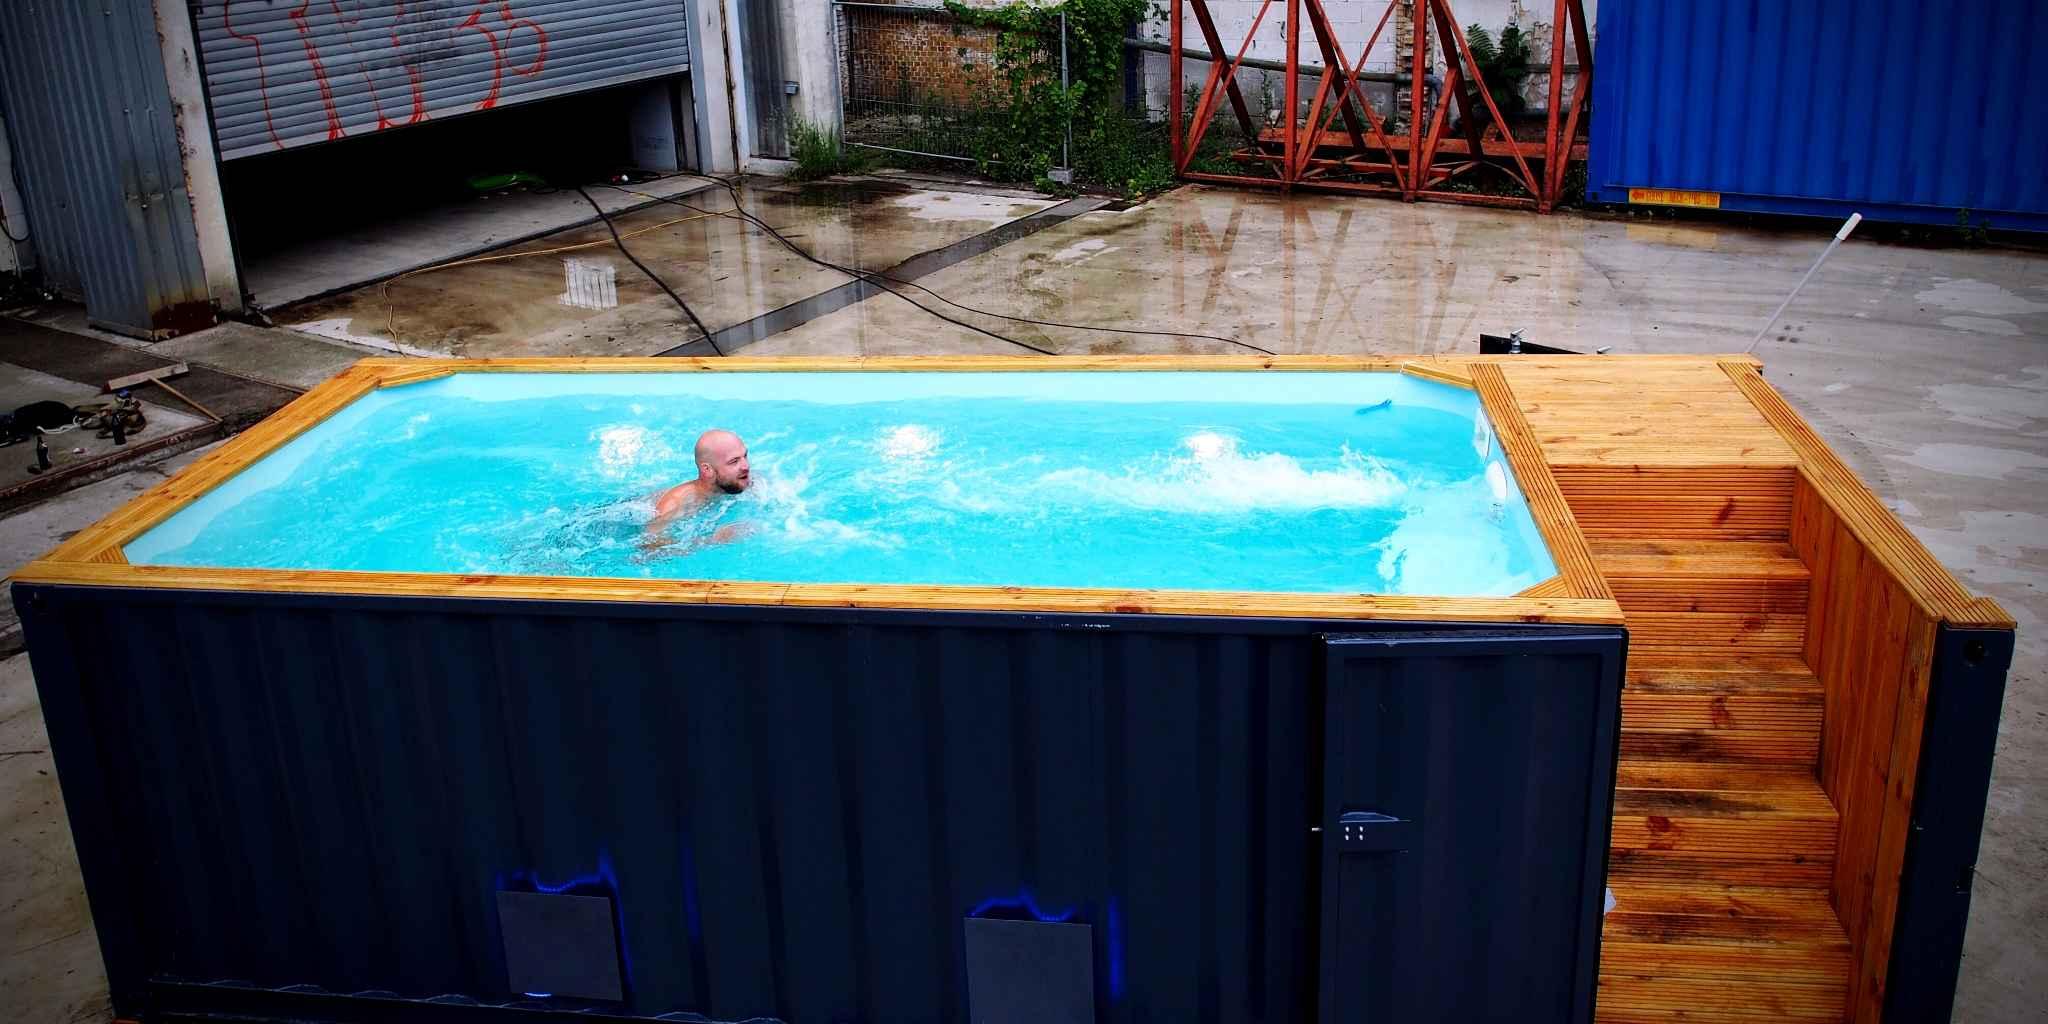 Awesome Gfk Pool Berlin Ideas - Einrichtungs & Wohnideen 2018 ...